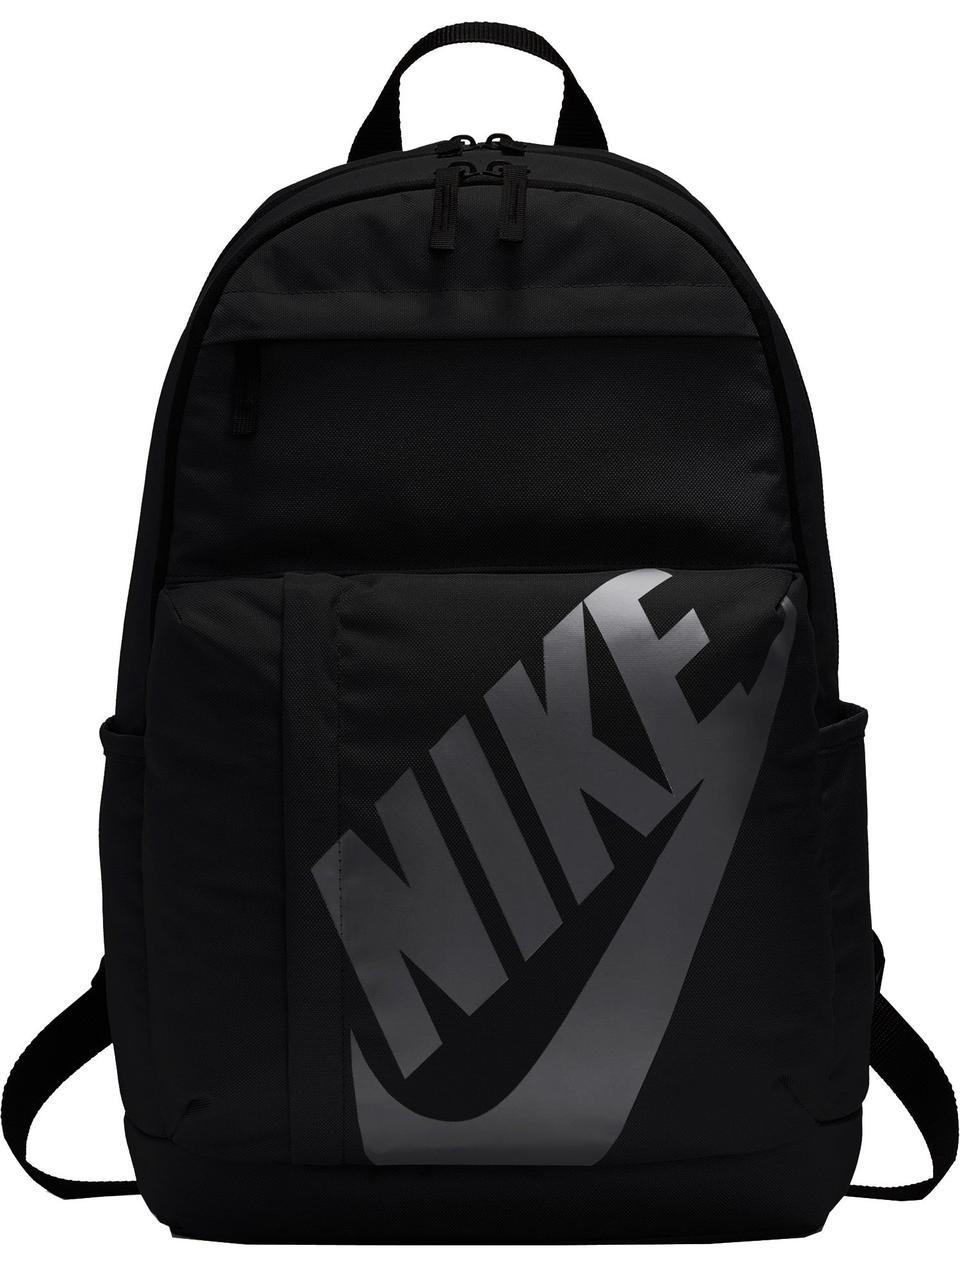 8f3981b2 Оригинальный рюкзак Nike Nk Elmntl Bkpk (BA5381 010), цена 1 050 грн ...